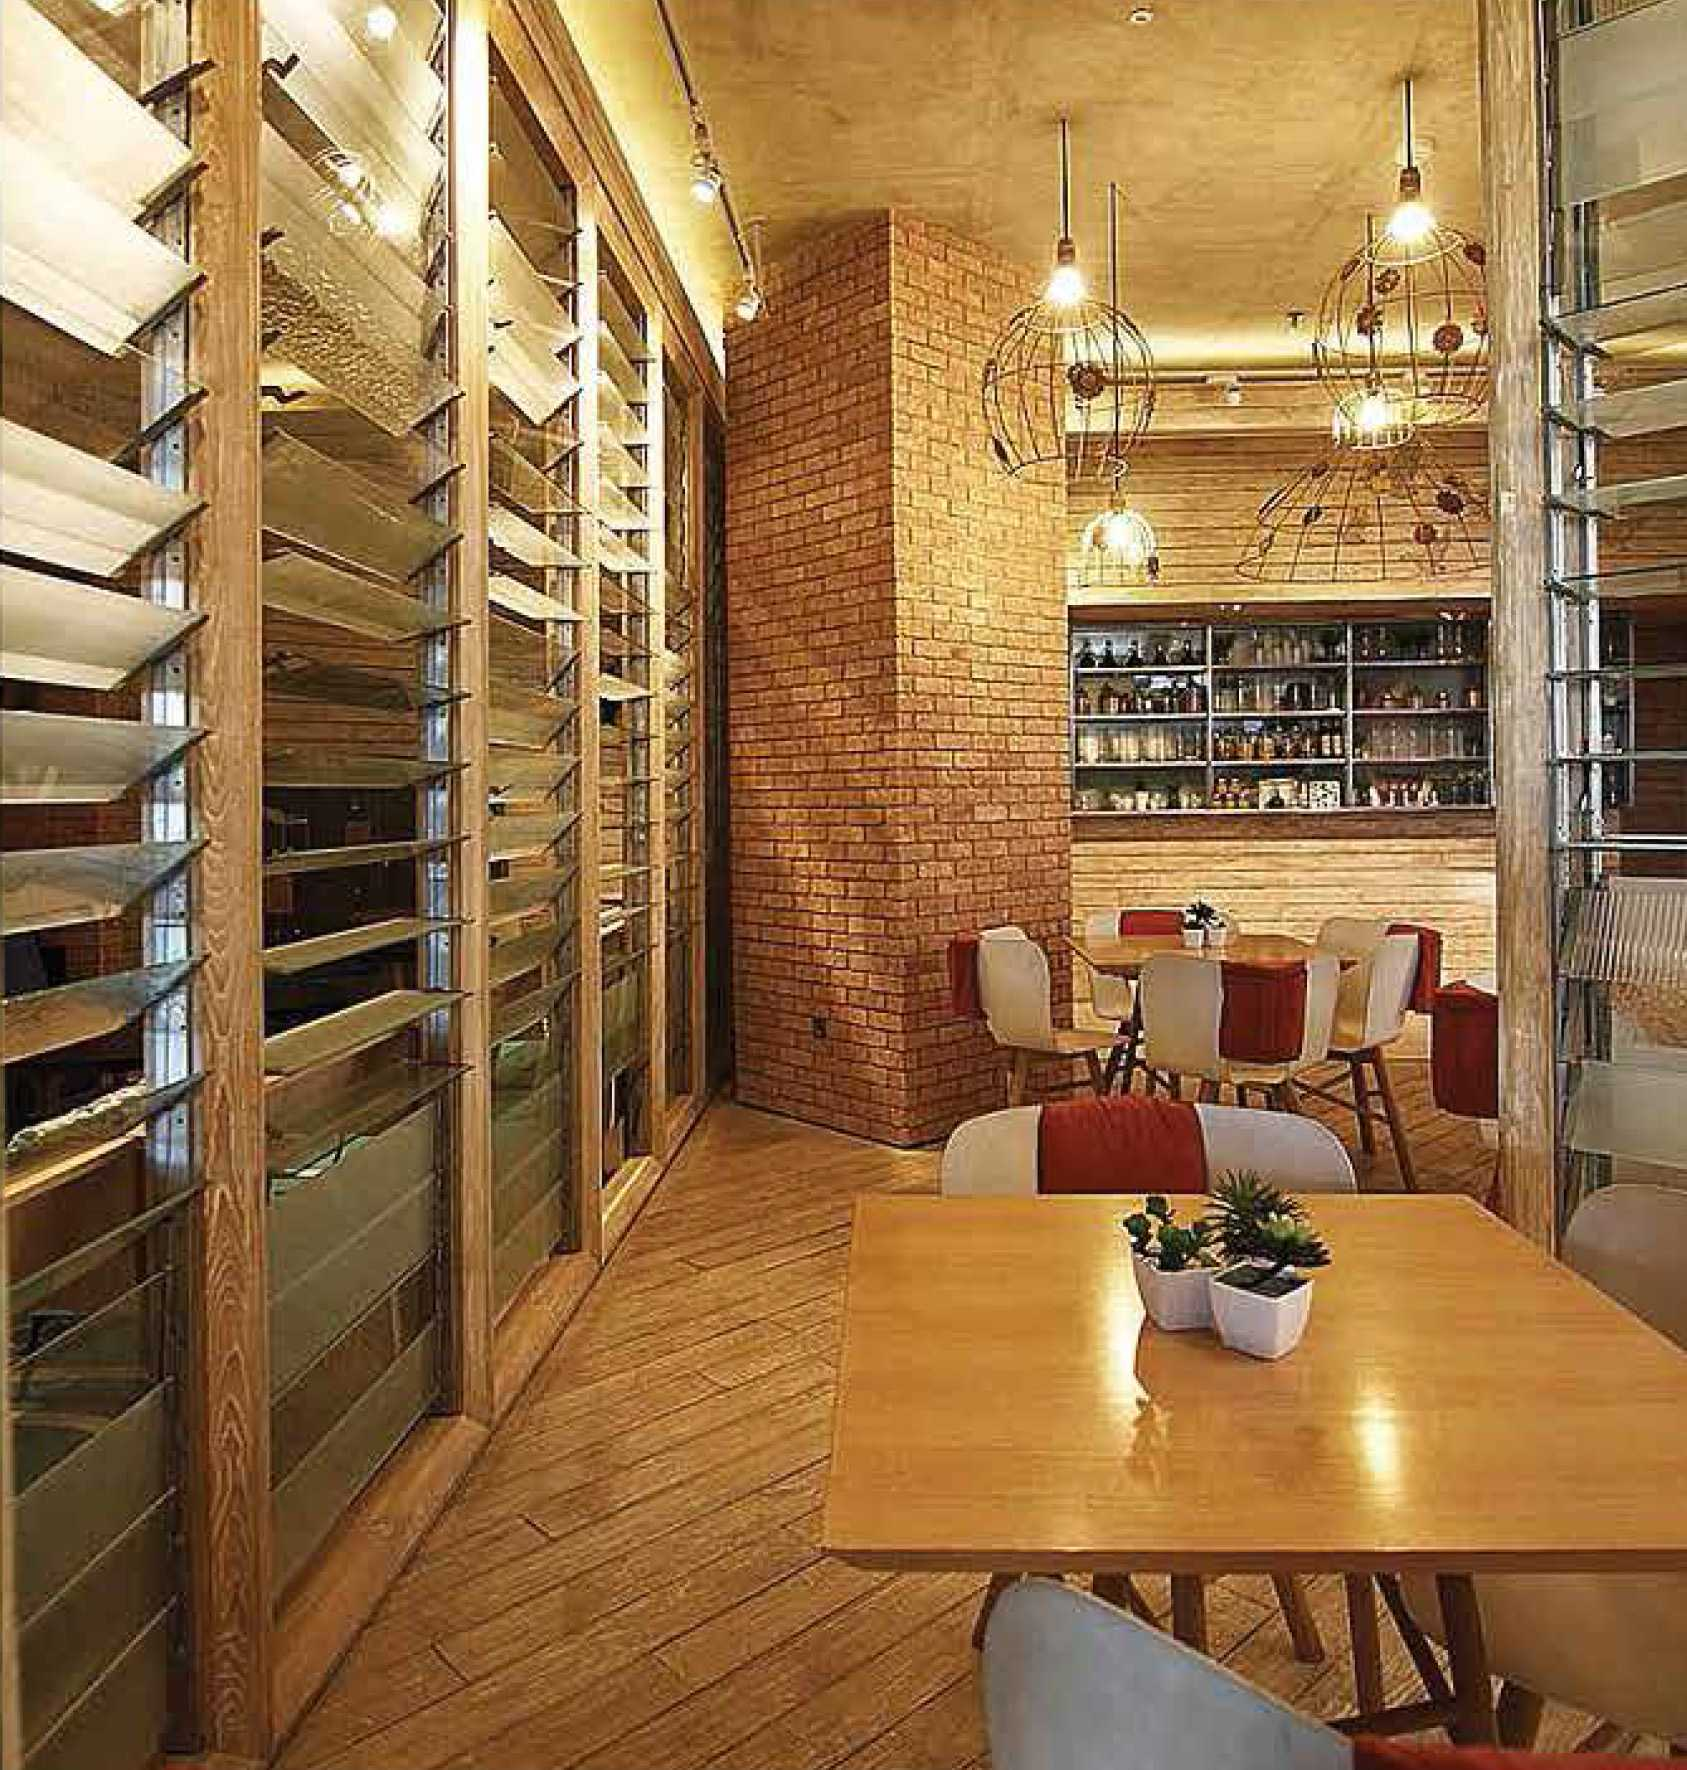 Platform Architects Whitebox At Kota Kasablanka Jakarta, Indonesia Jakarta, Indonesia Seating Area Restaurant   8377